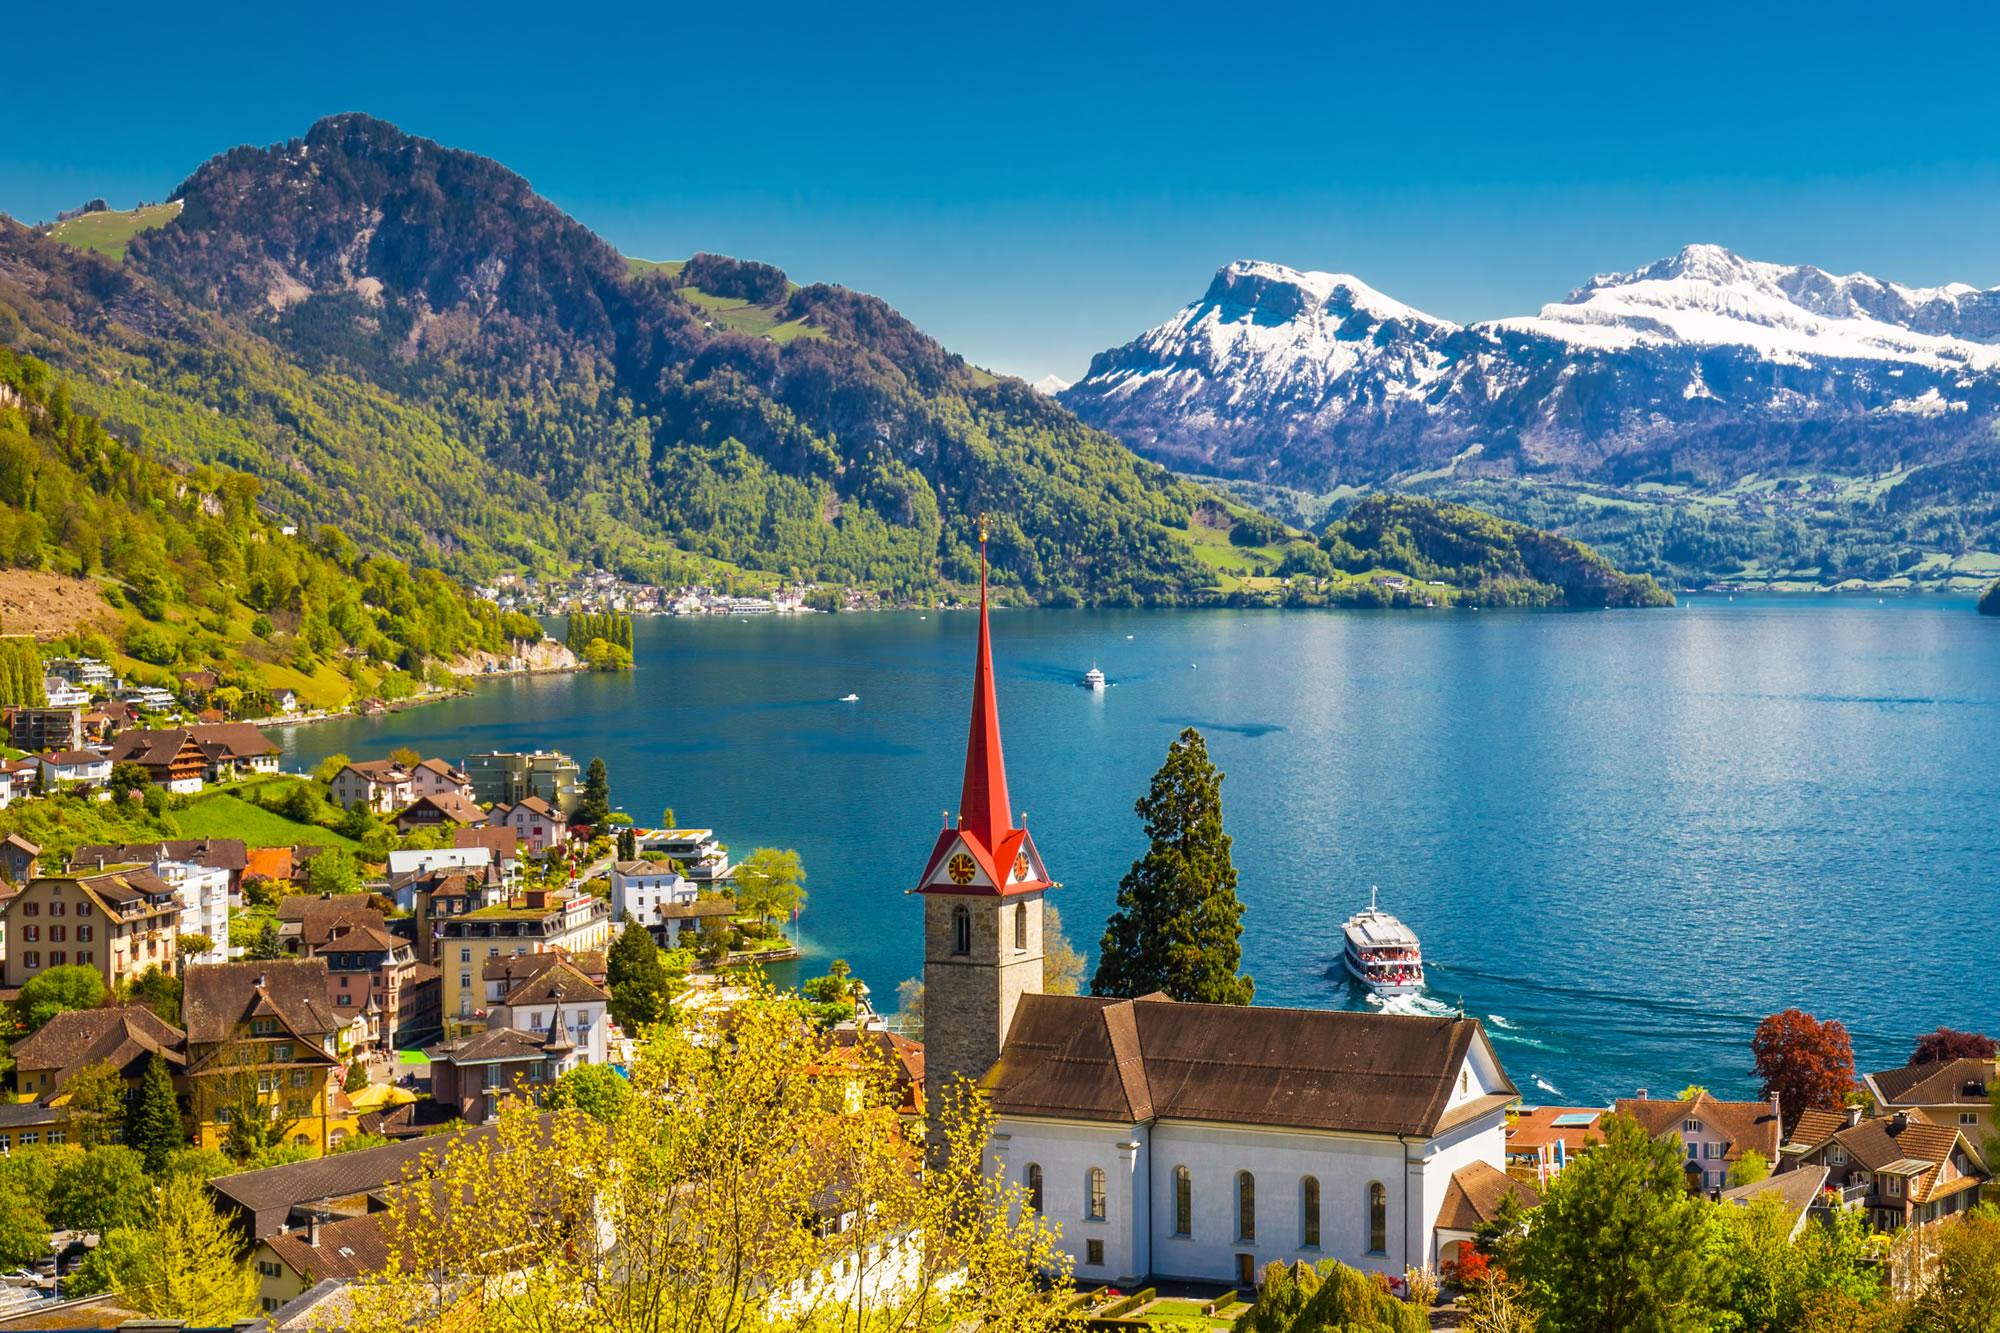 Weggis village with the view of Pilatus mountain Switzerland